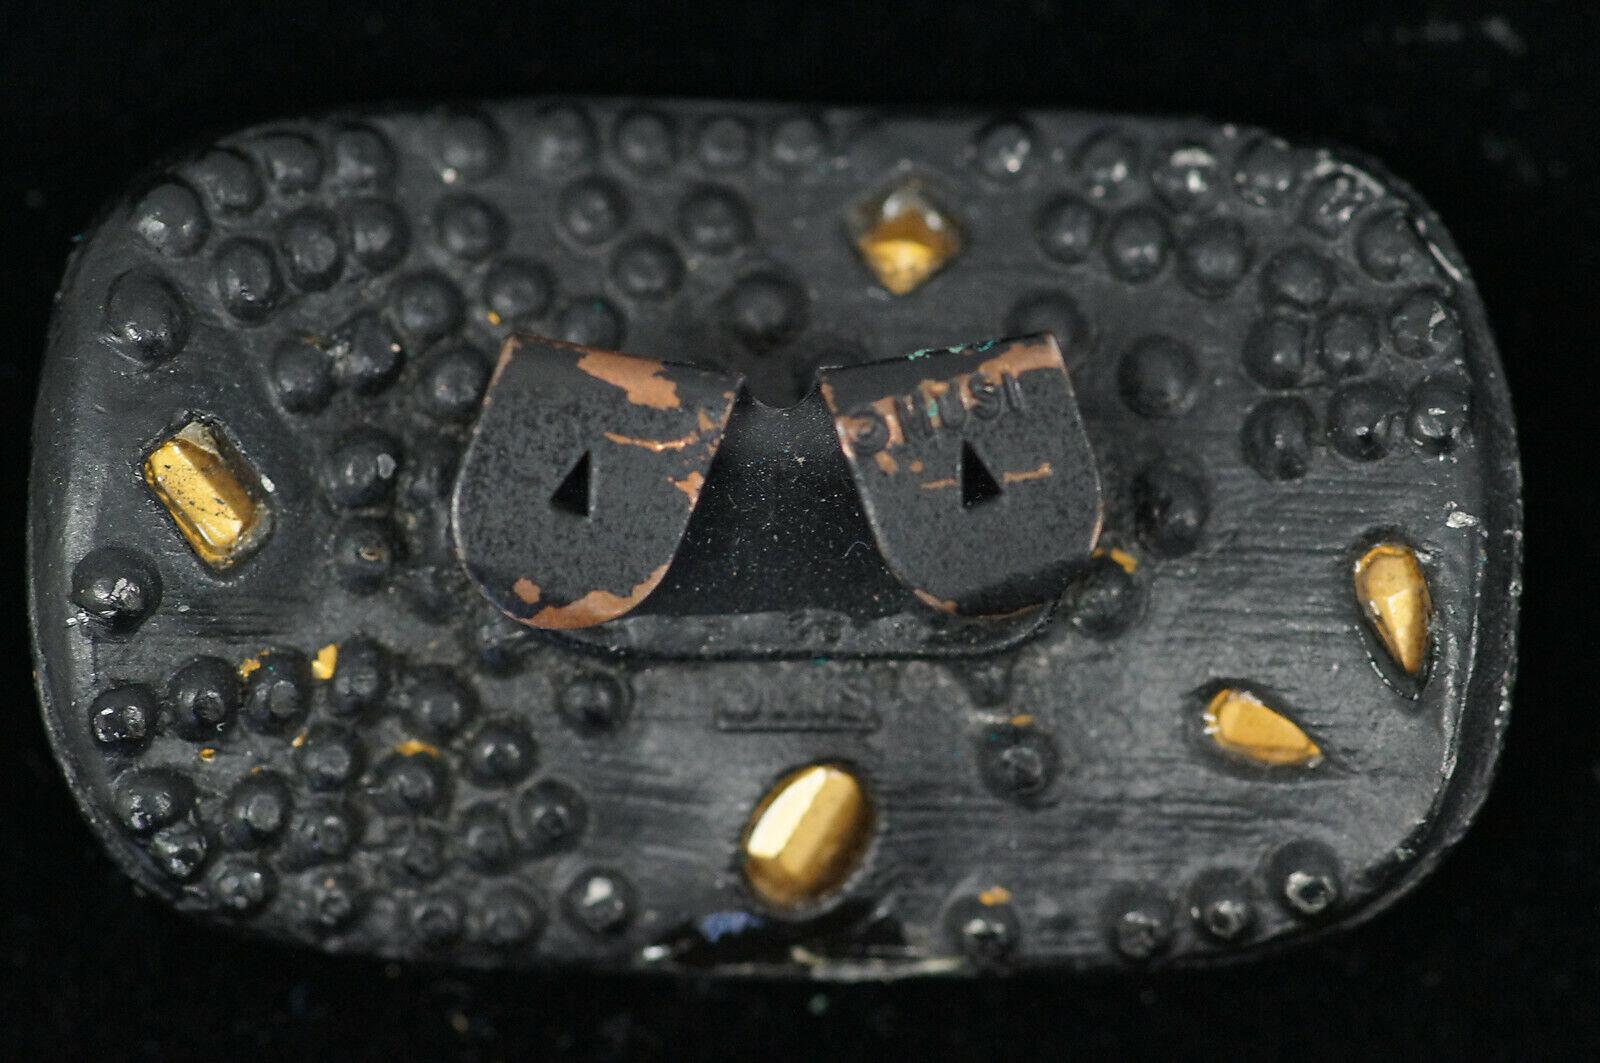 Lot of 5 Fashion Belt Buckles Gold Tone Colored Stones Etc - B2582 B4